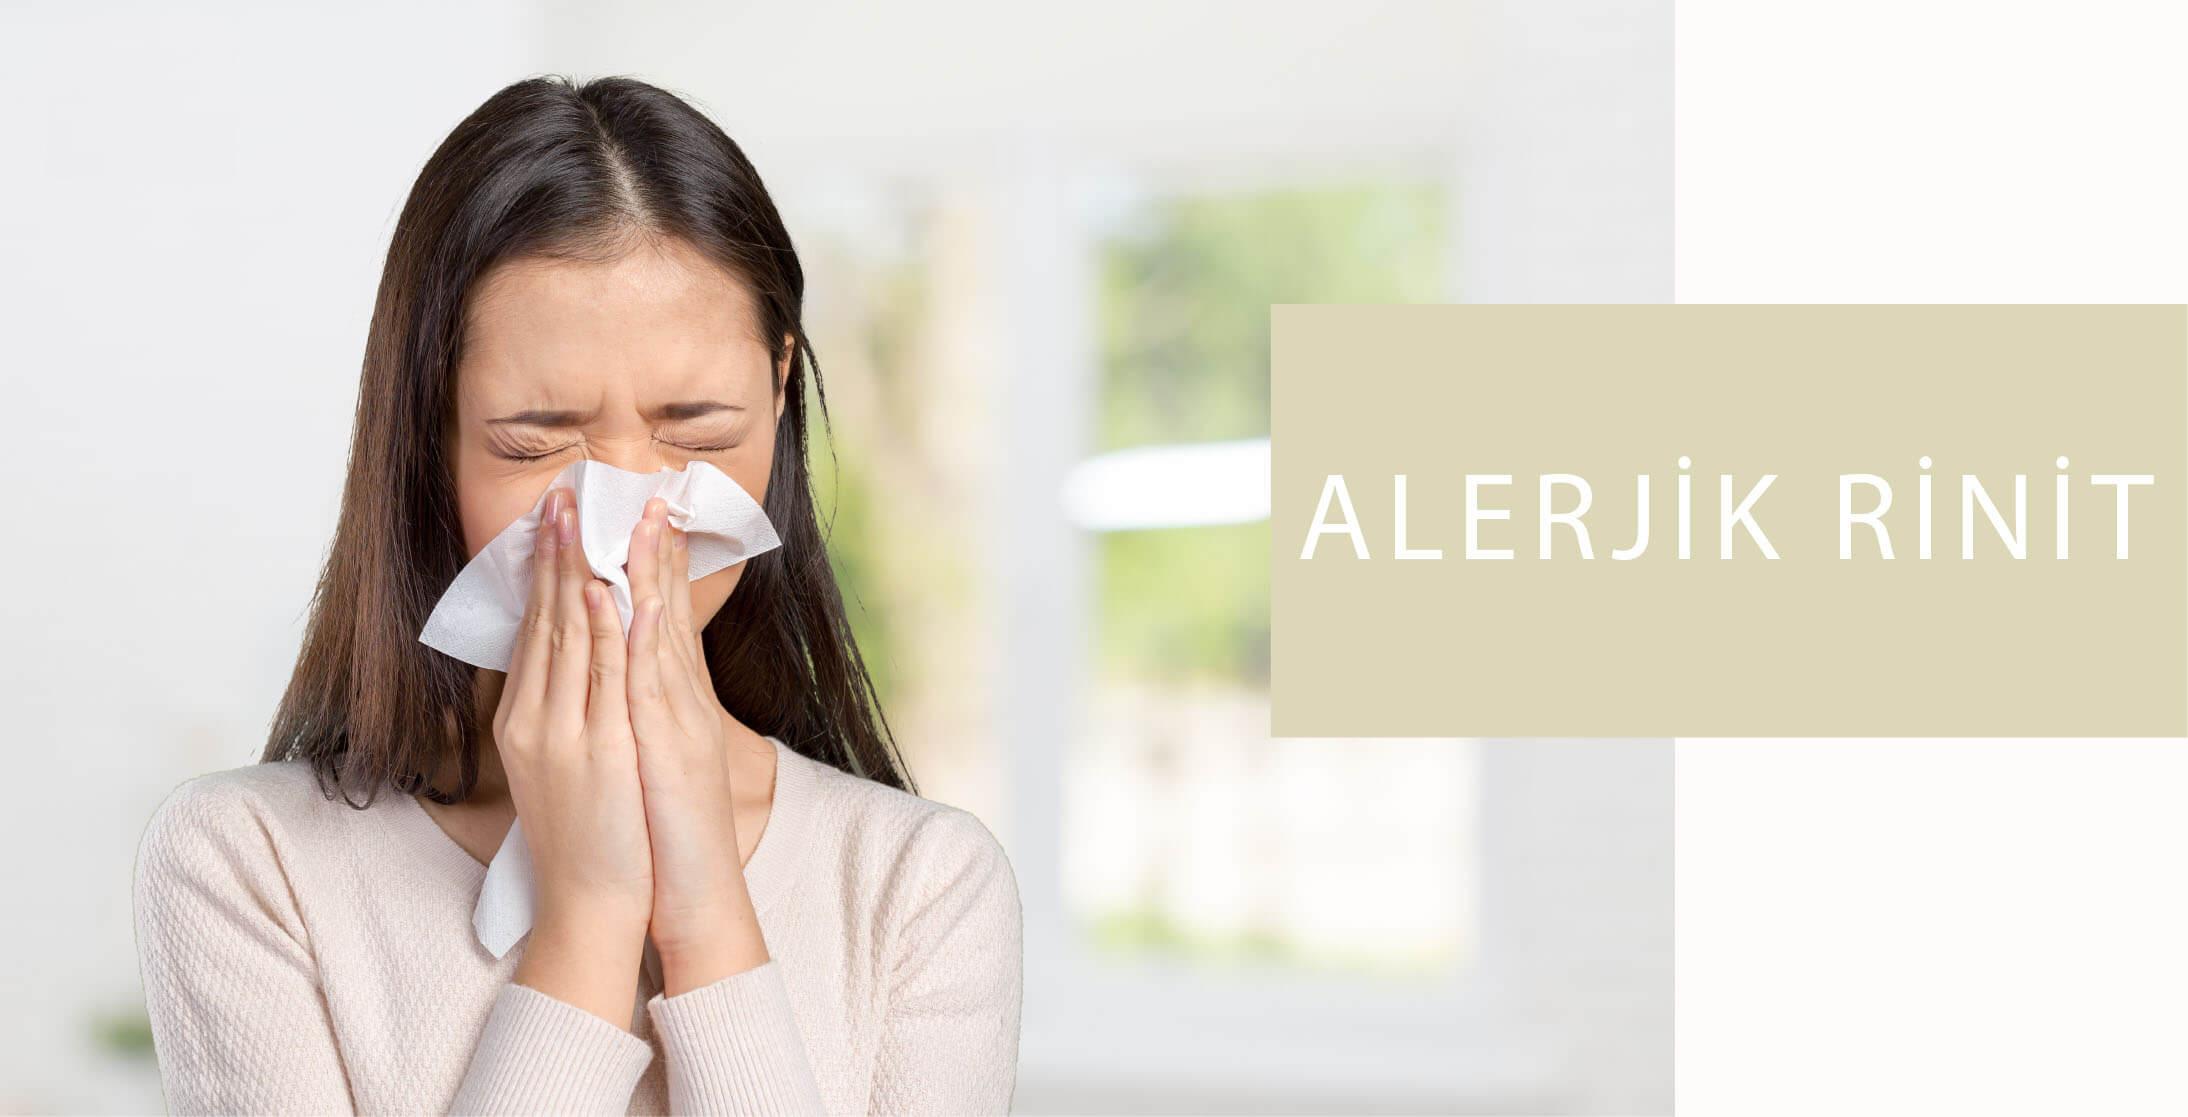 alerjik-rinit